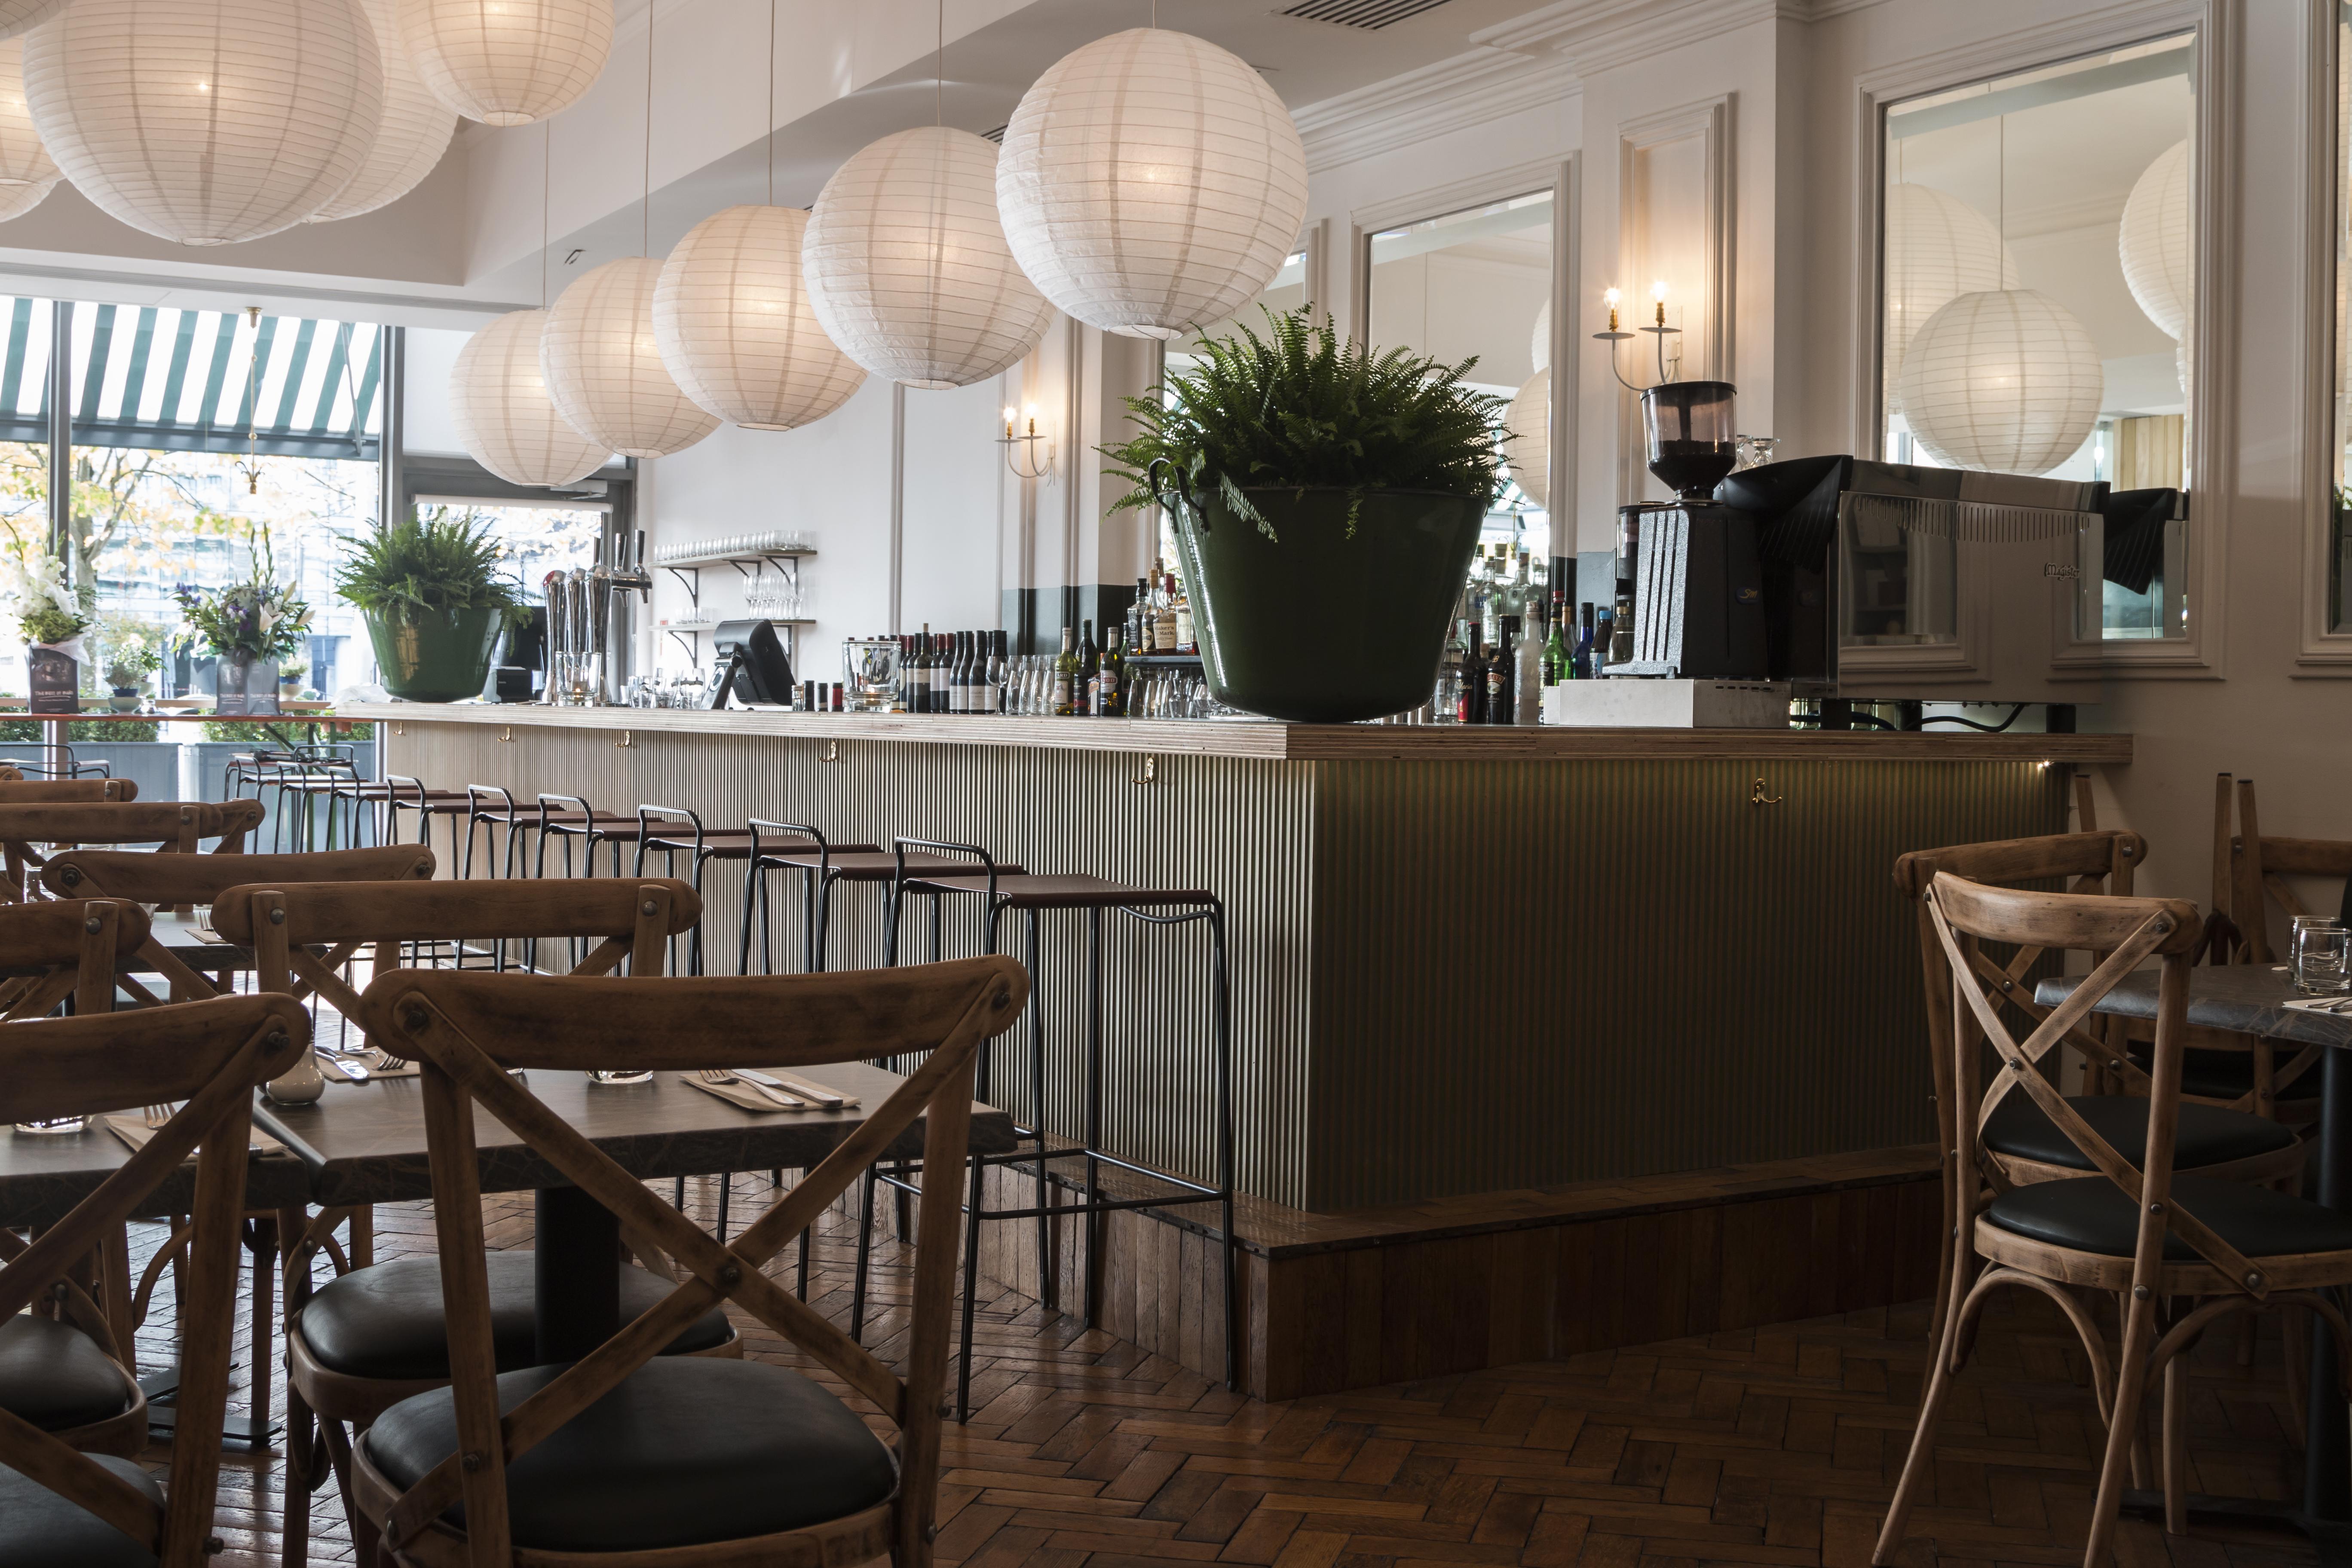 Dockland Deli, Bar & Restaurant